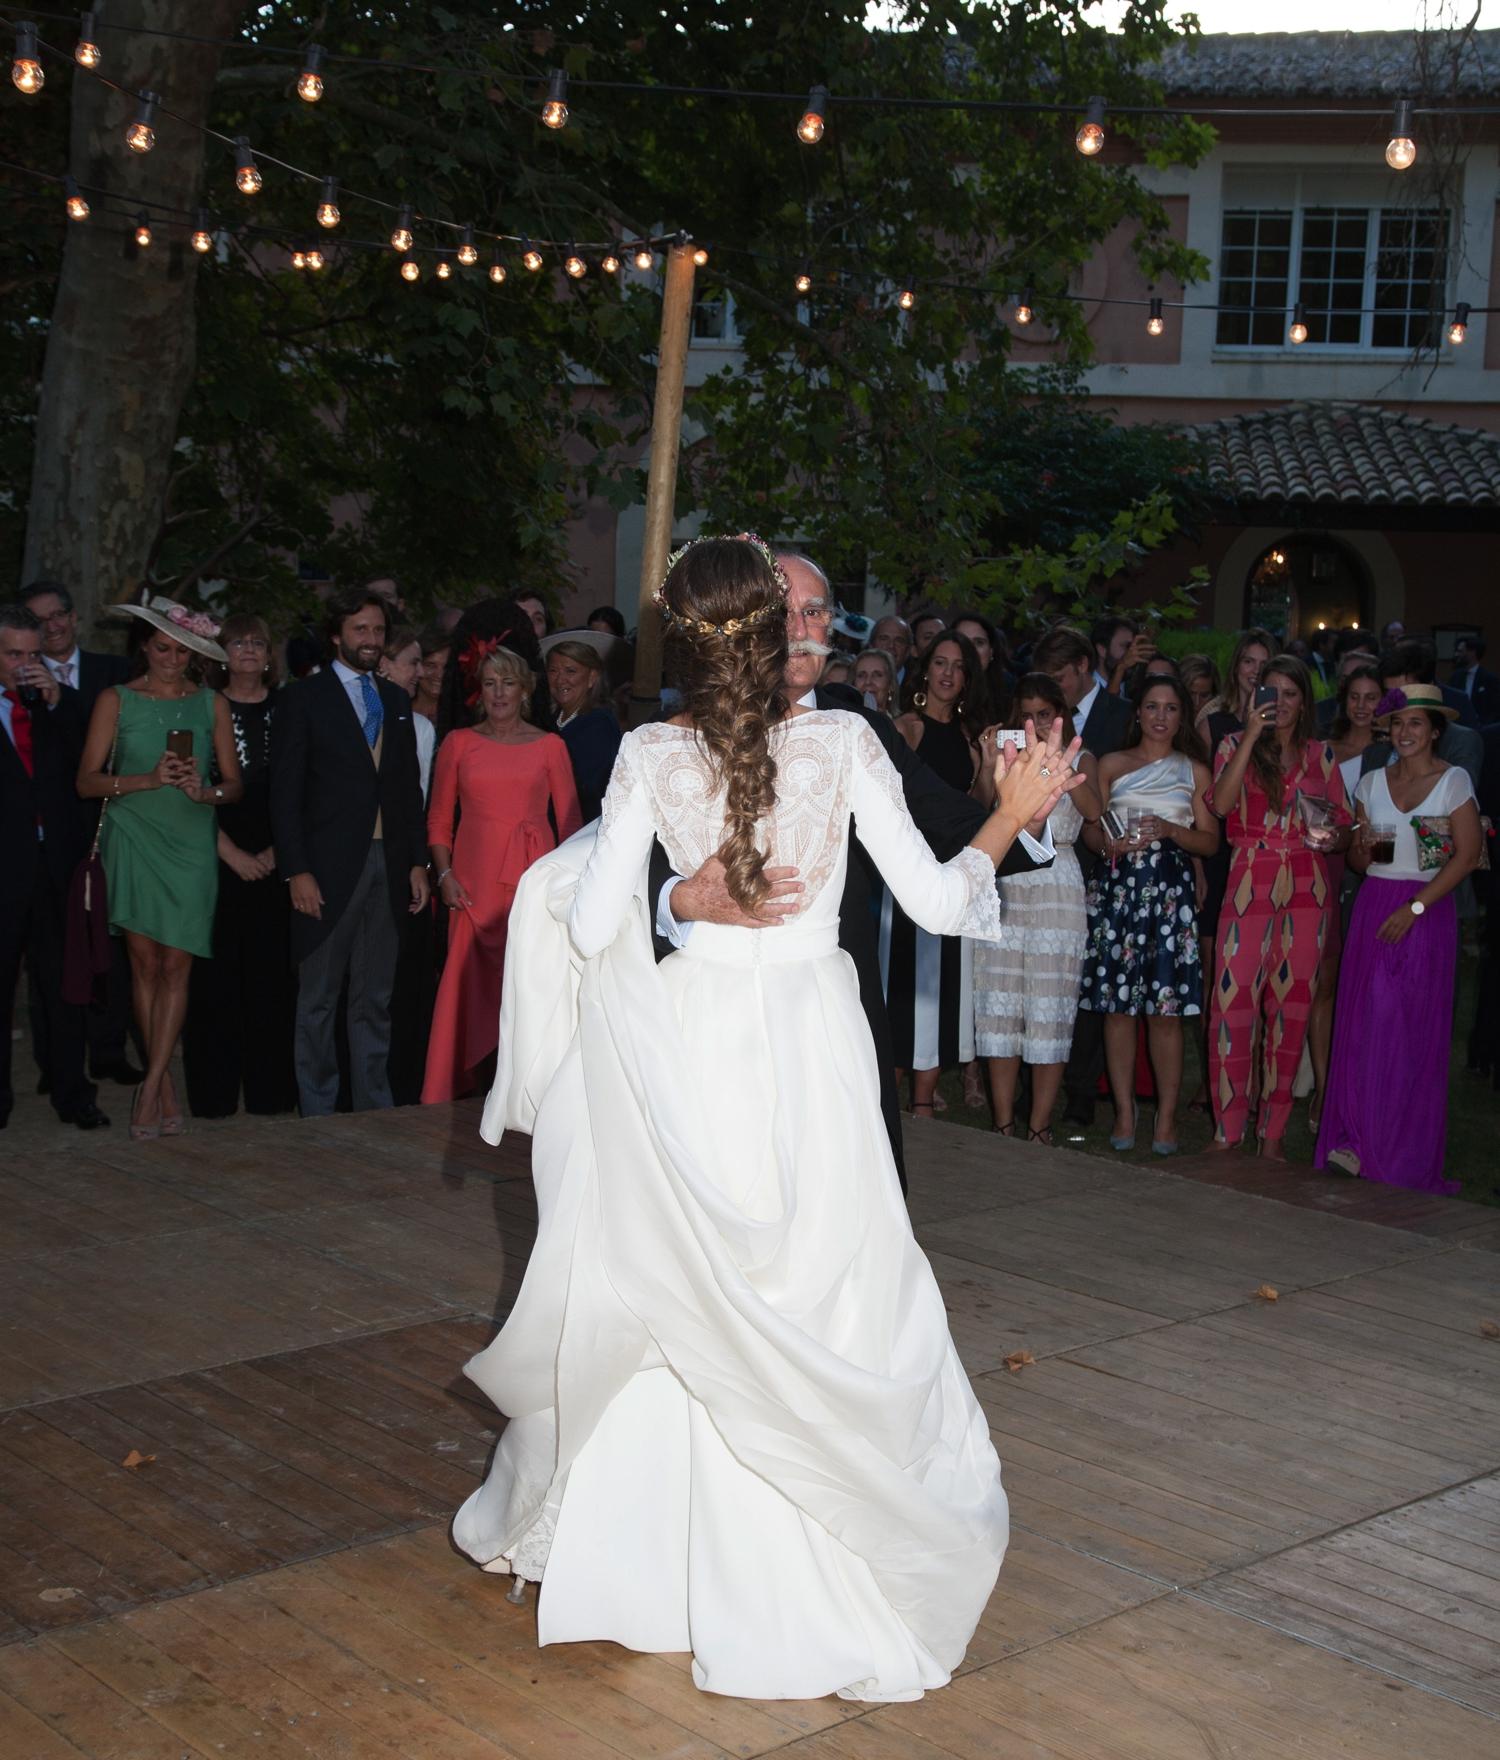 bodas-made-in-style-vestido-de-novia-navascues-baile-boda-de-bea-y-juan